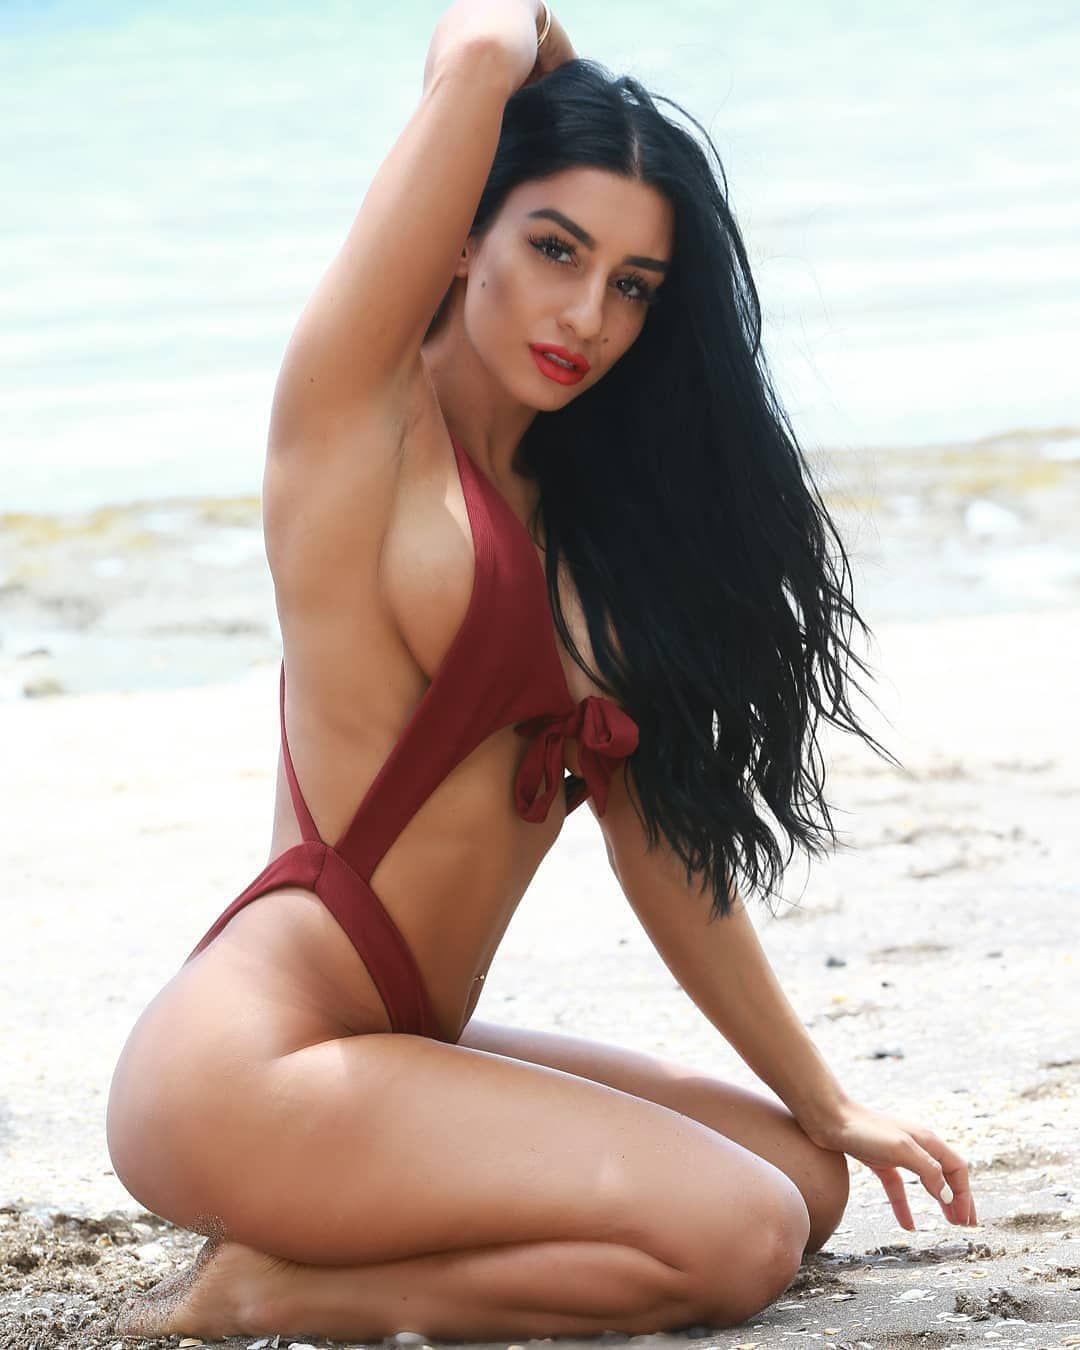 Swimsuit Nude Chicago Frauen Gif